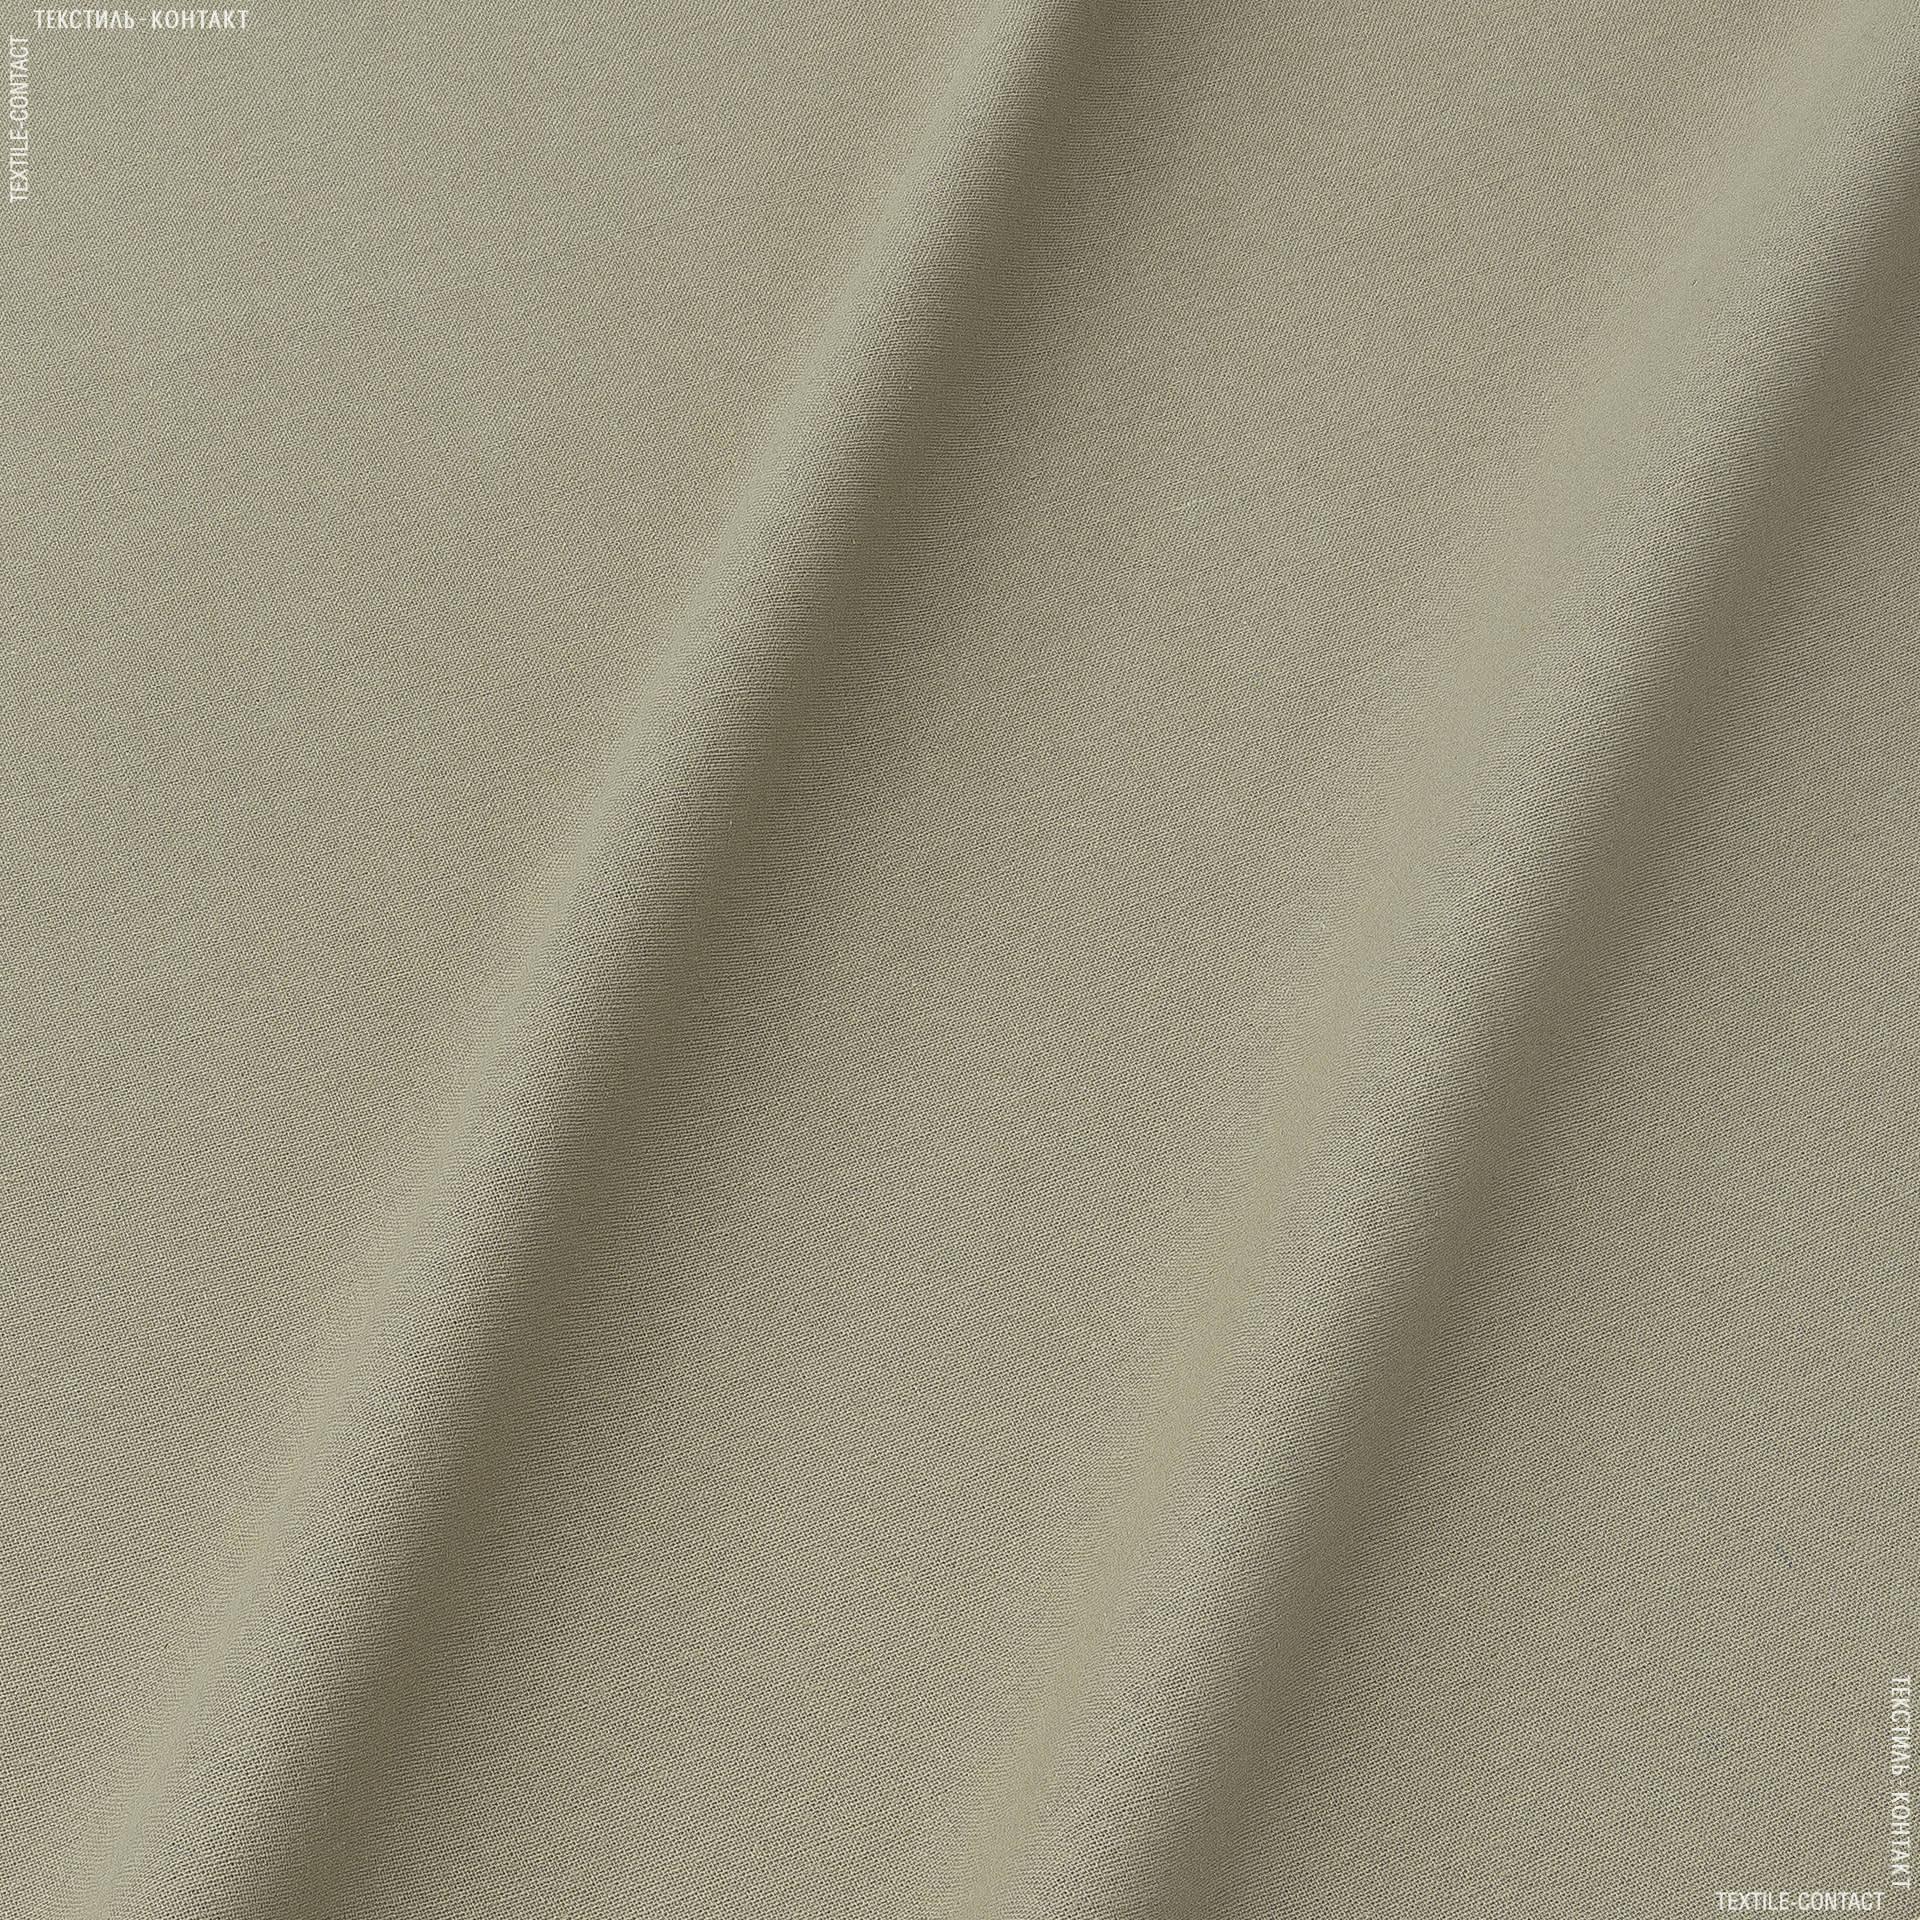 Ткани для костюмов - Лен гранд бежевый